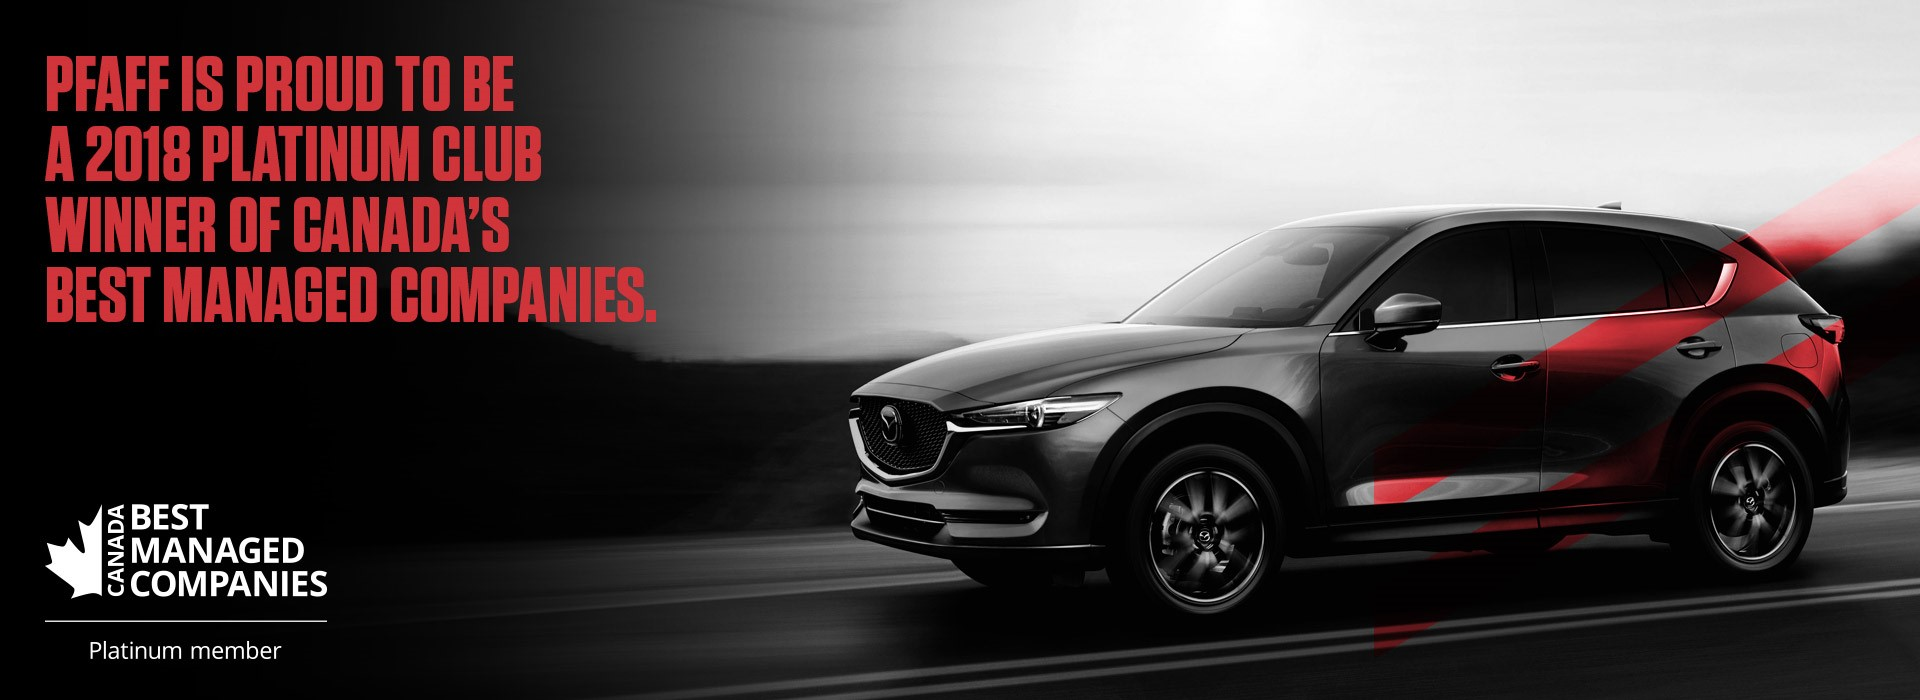 London City Mazda - London Ontario Mazda Dealership